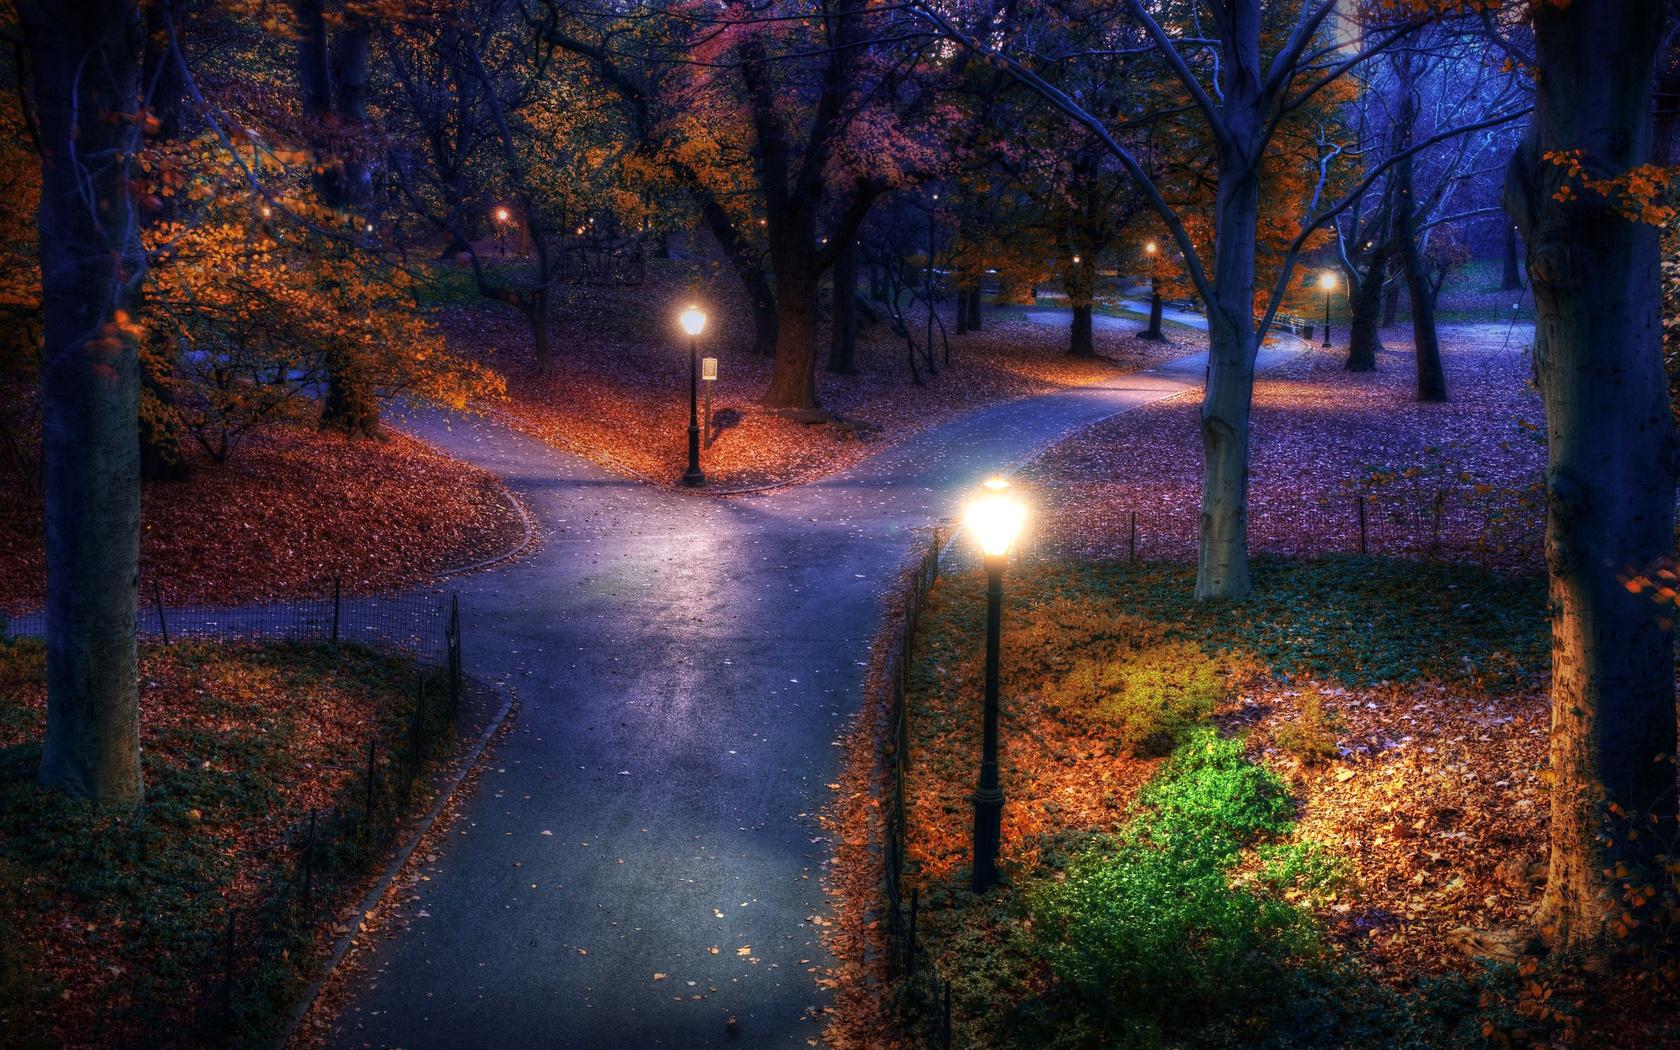 картинка вечерний свет